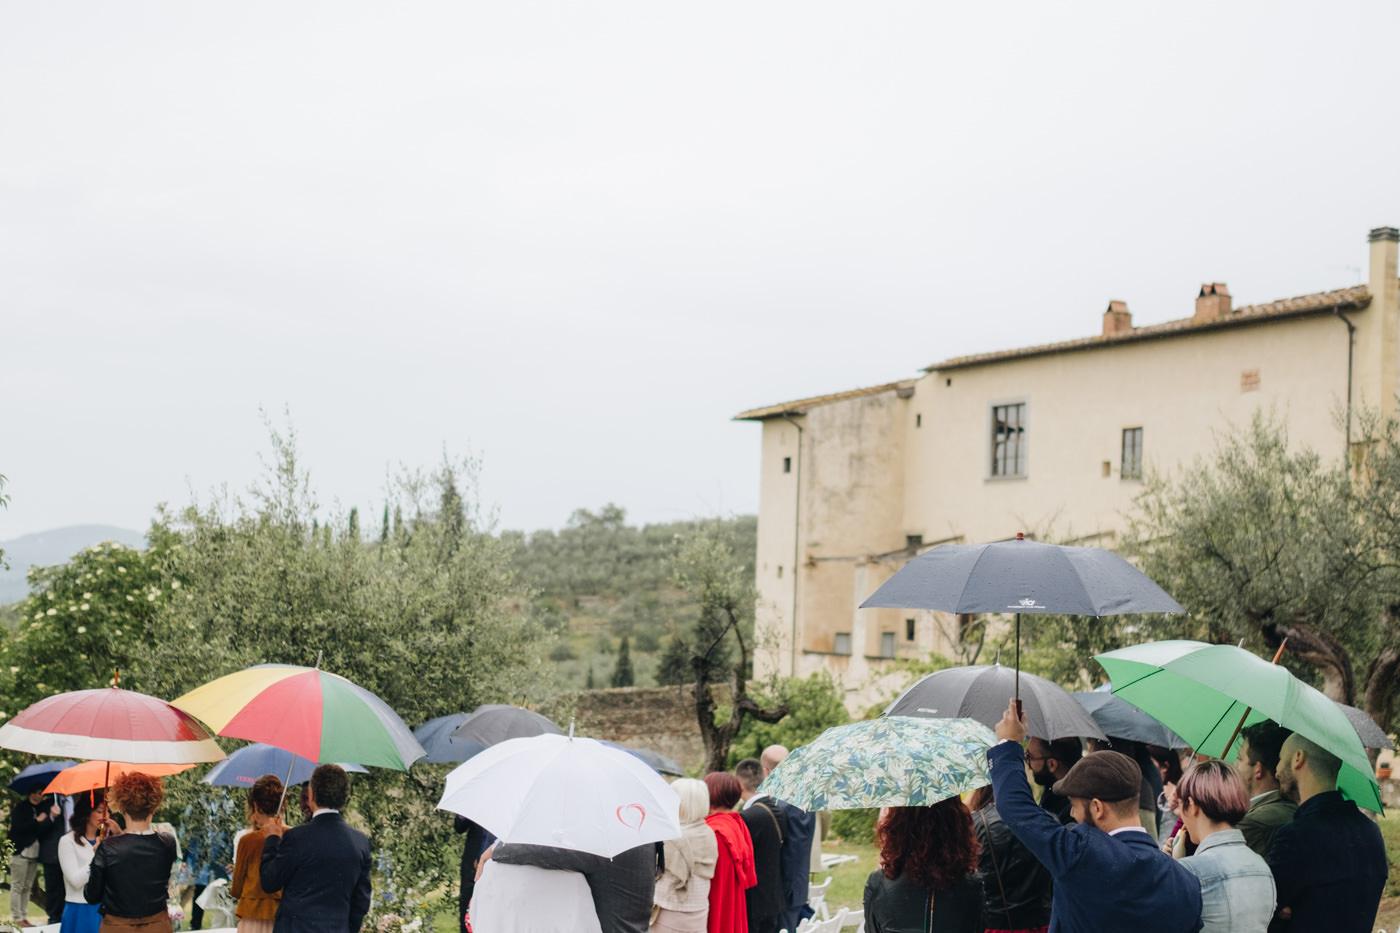 matrimoni_all_italiana_fotografo_matrimonio_toscana-39.jpg